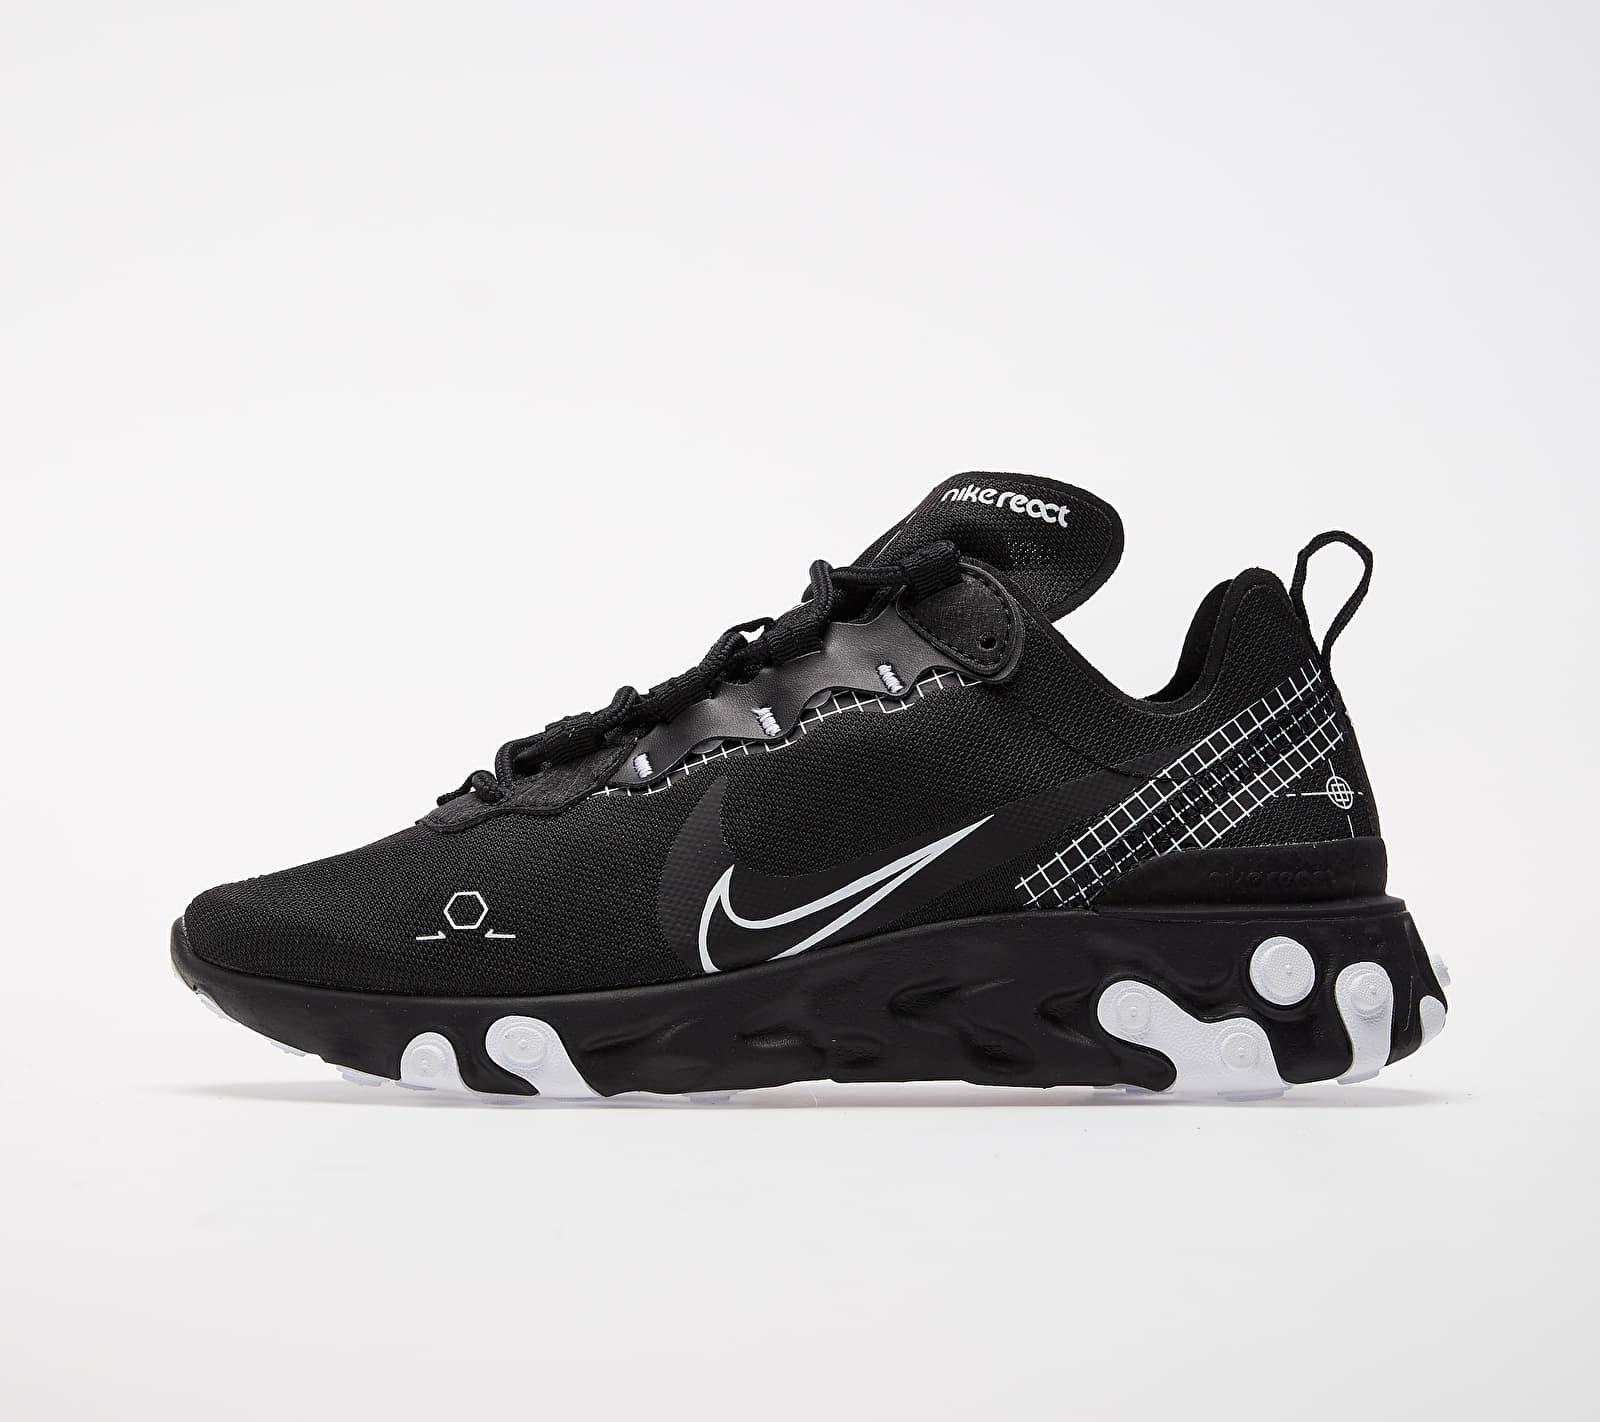 Nike React Element 55 Black/ White CU3009-001